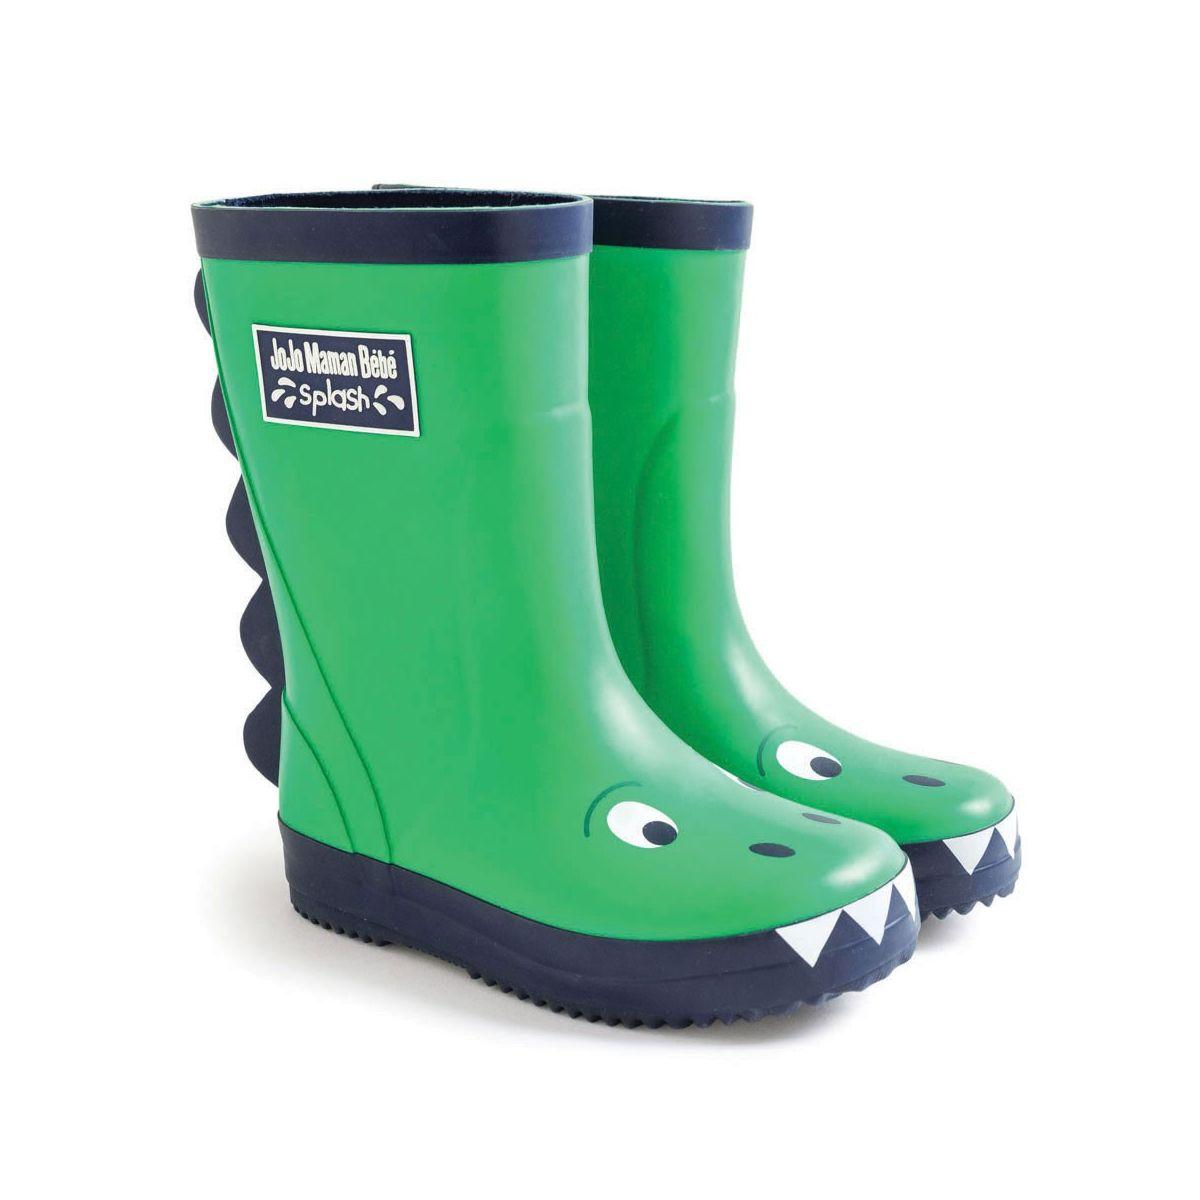 Botas de Agua para Niños Dinosaurio - ShopMami 7b454dd32d6ed